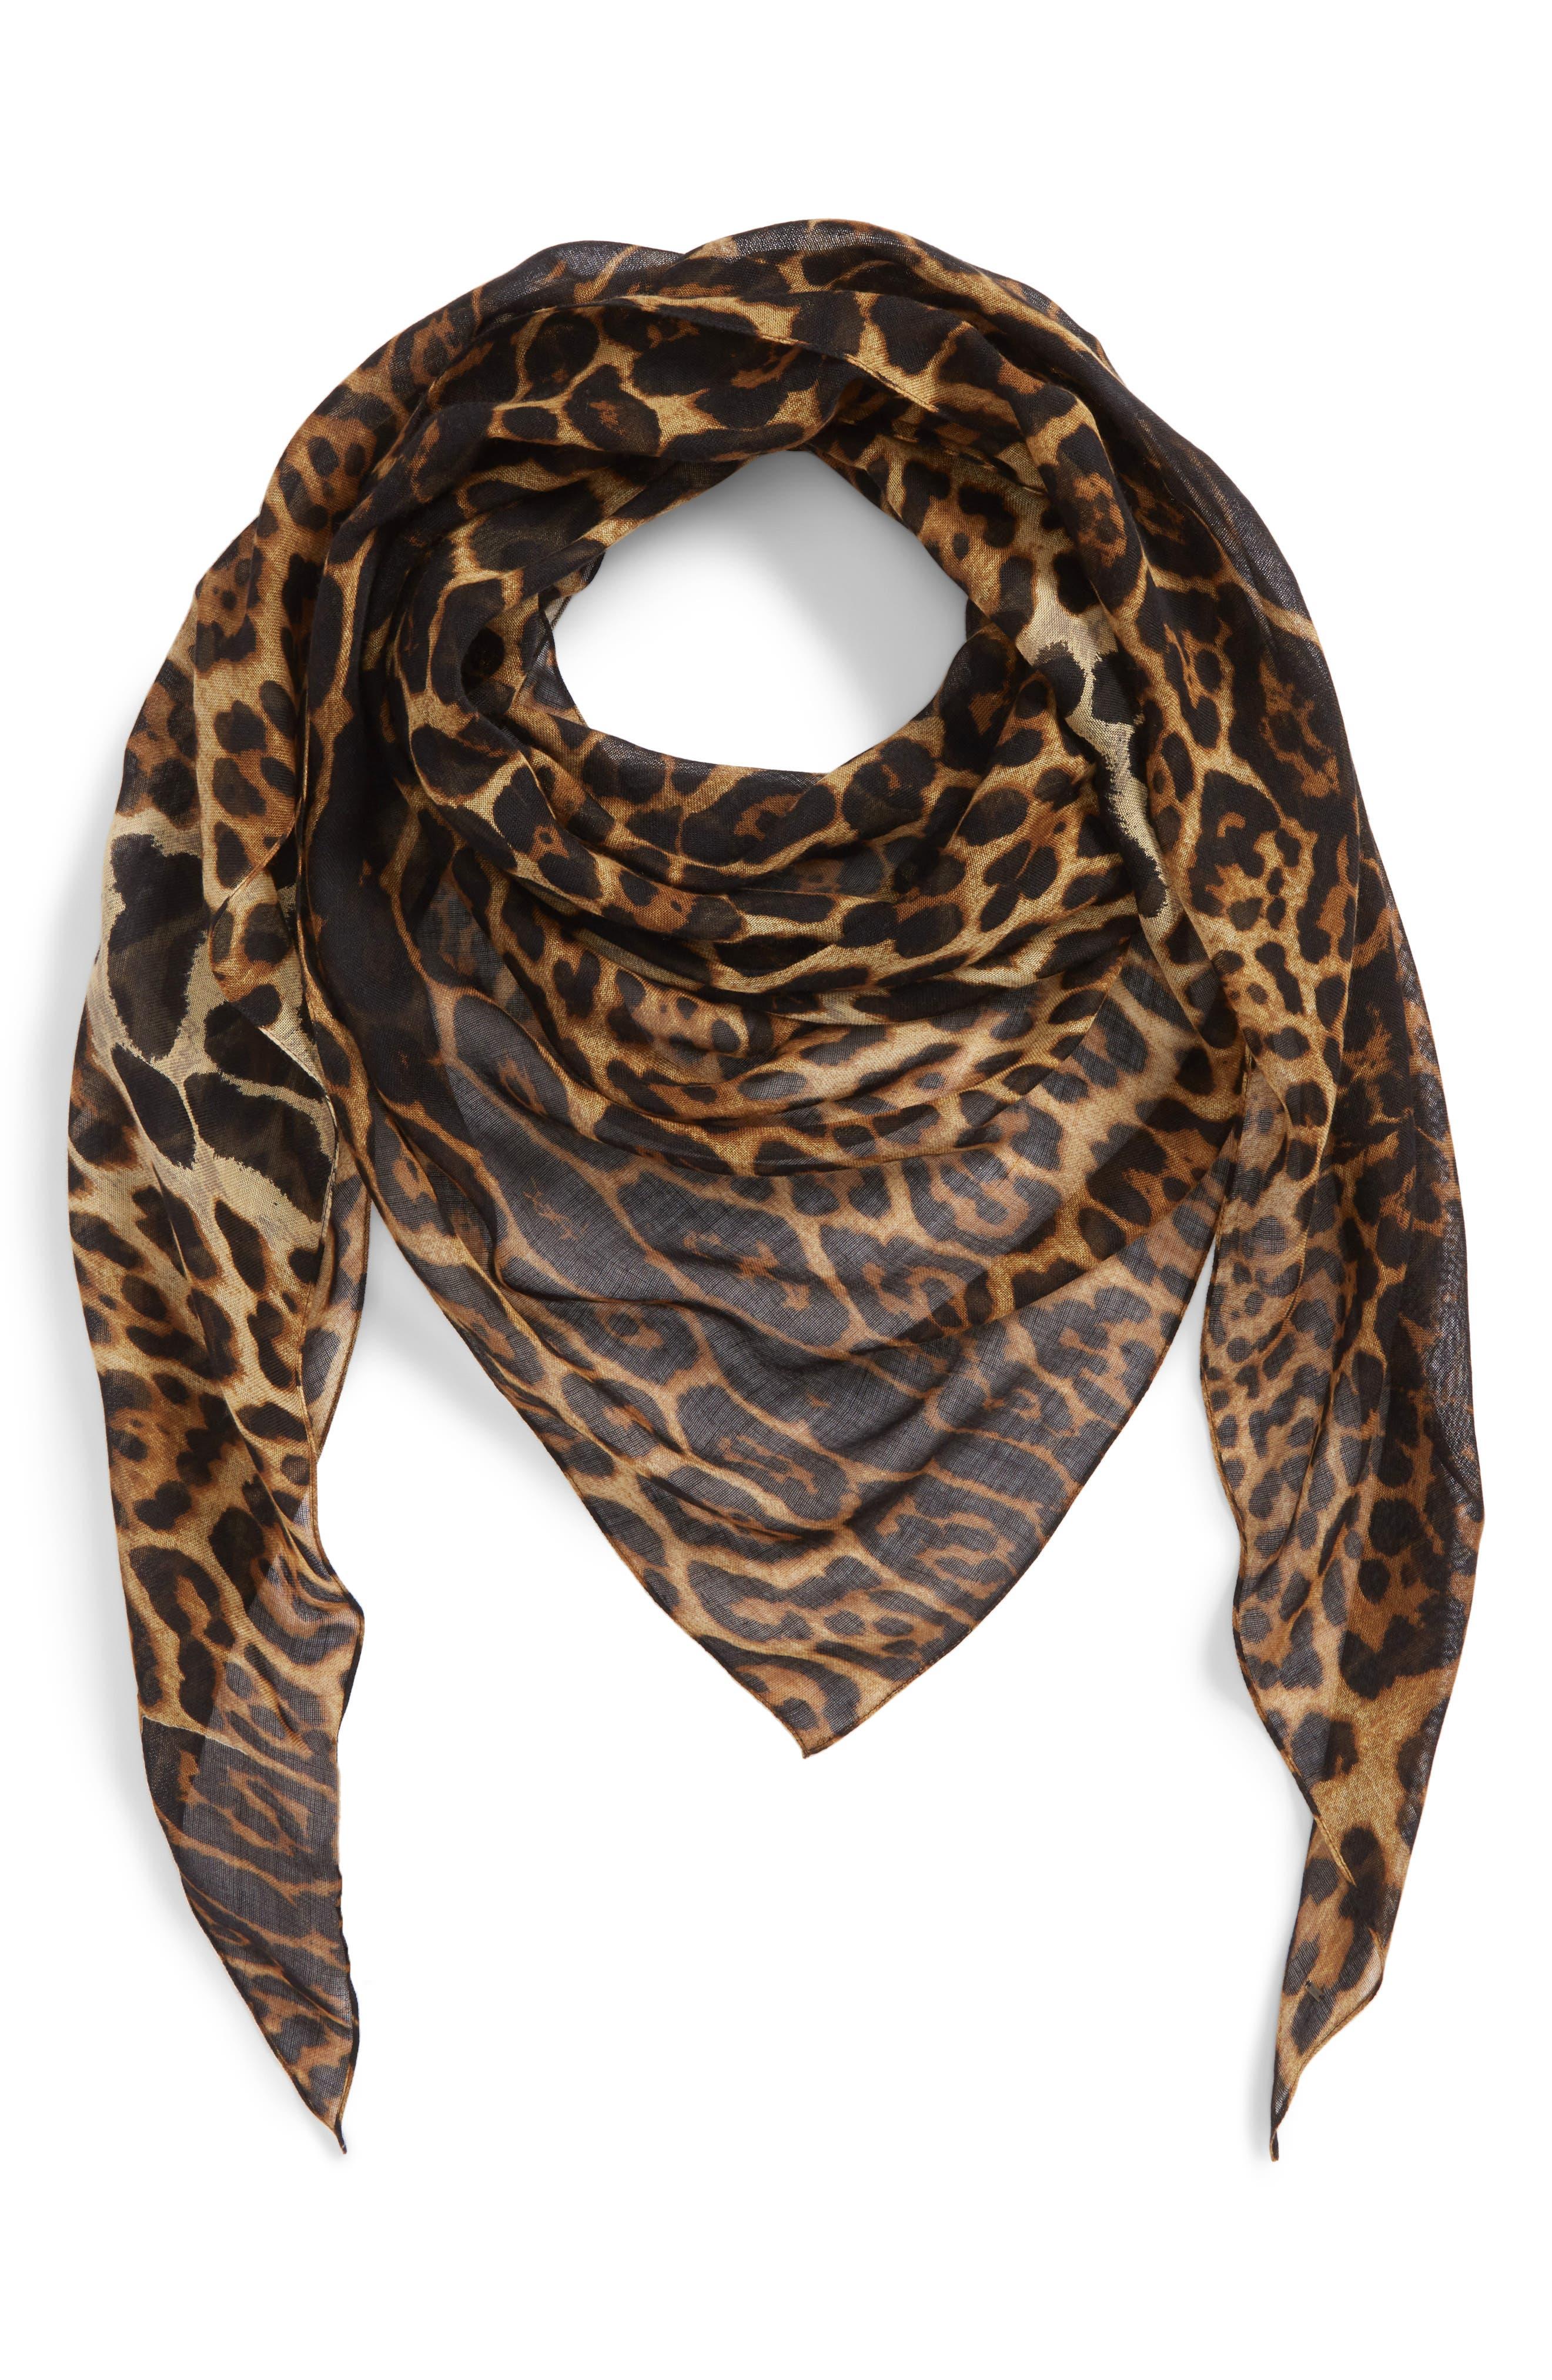 YSL Leopard Print Cashmere & Silk Triangle Scarf,                             Alternate thumbnail 2, color,                             001